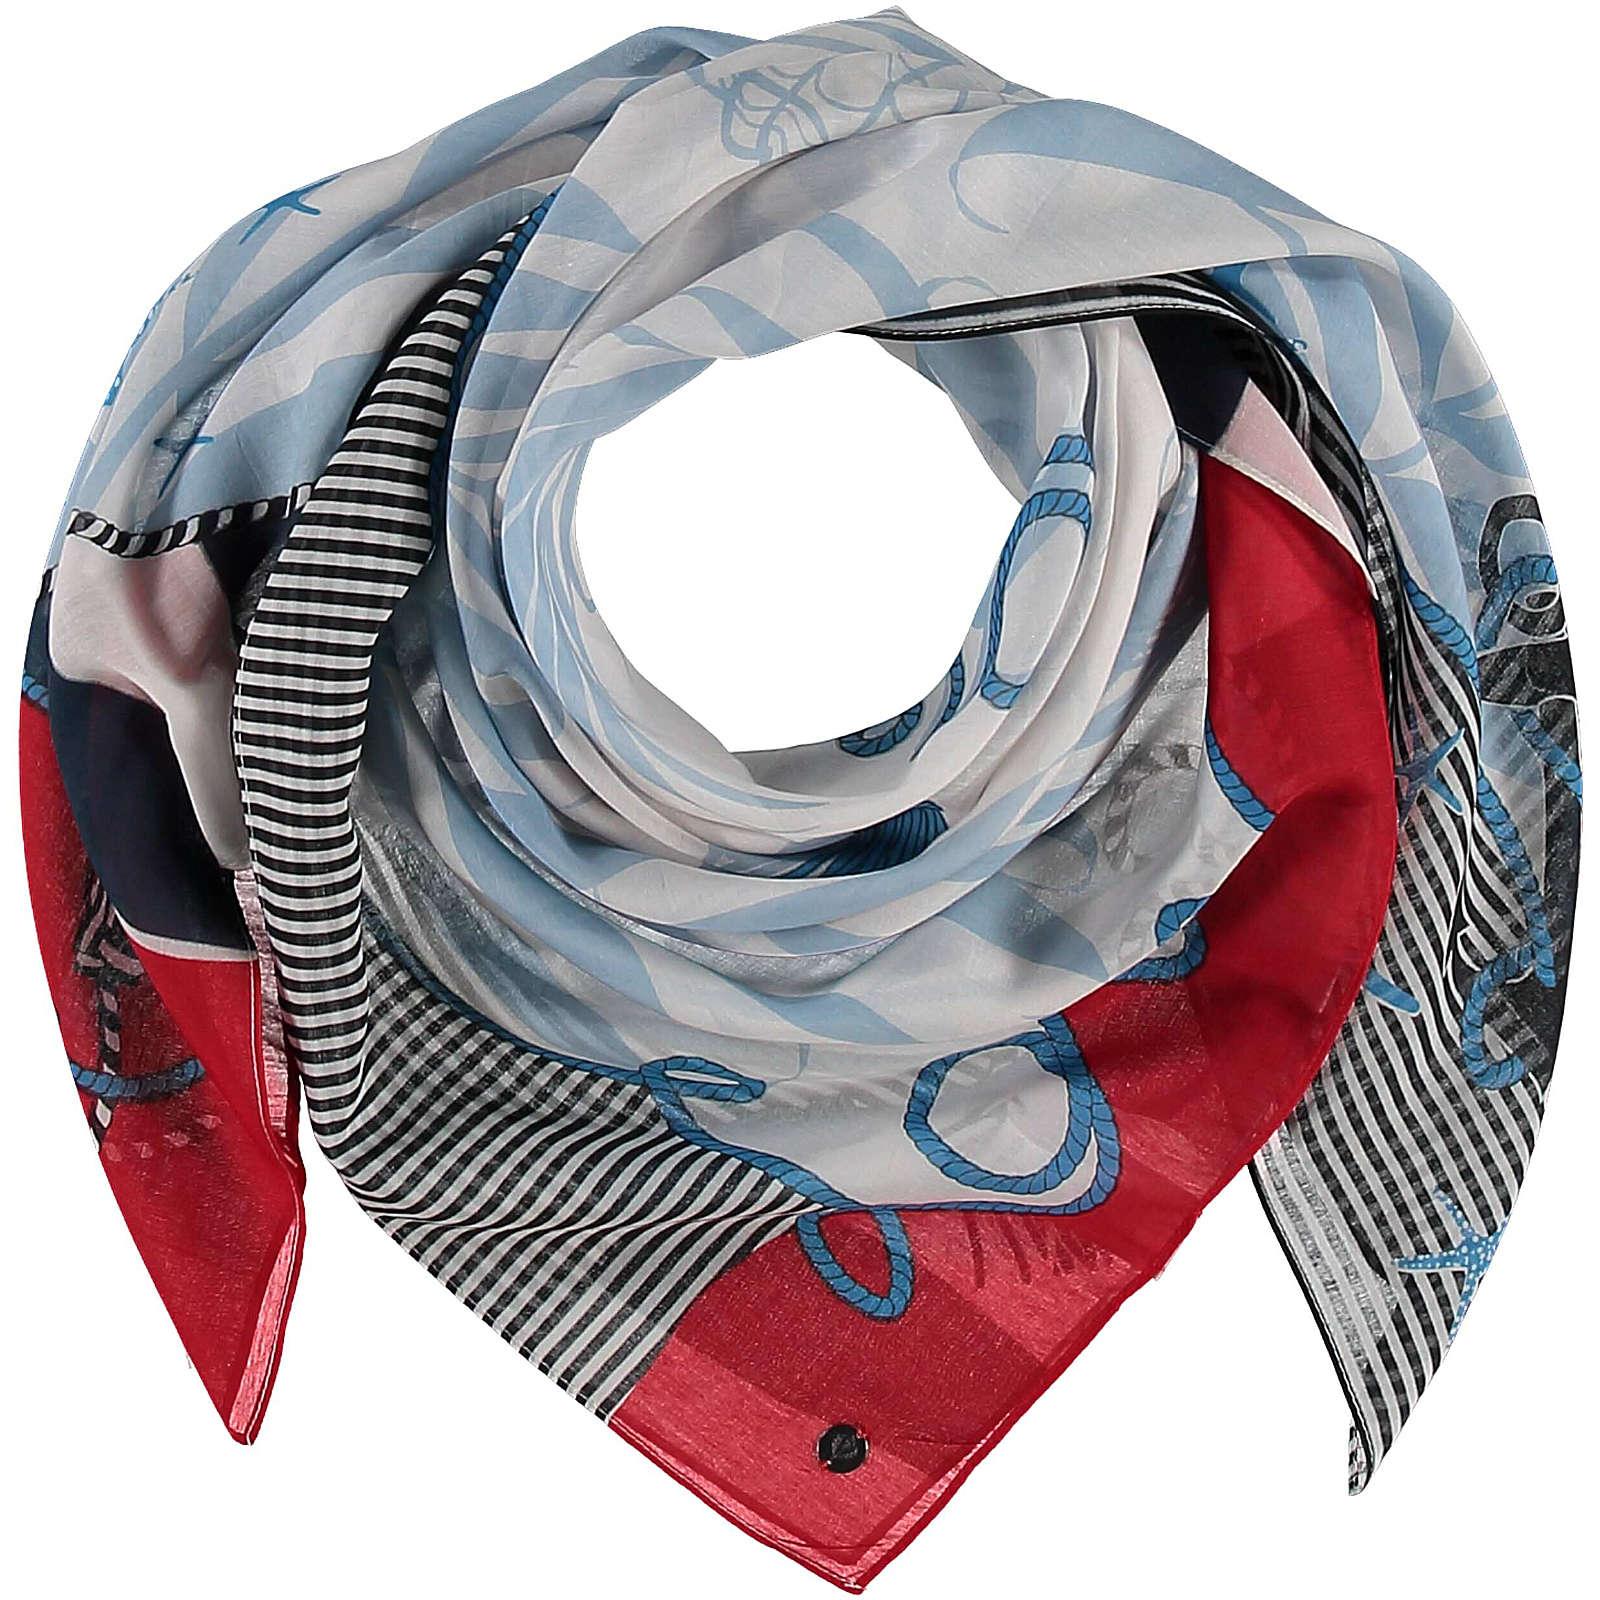 FRAAS Tuch in Baumwollmischung Halstücher natur Damen Gr. one size